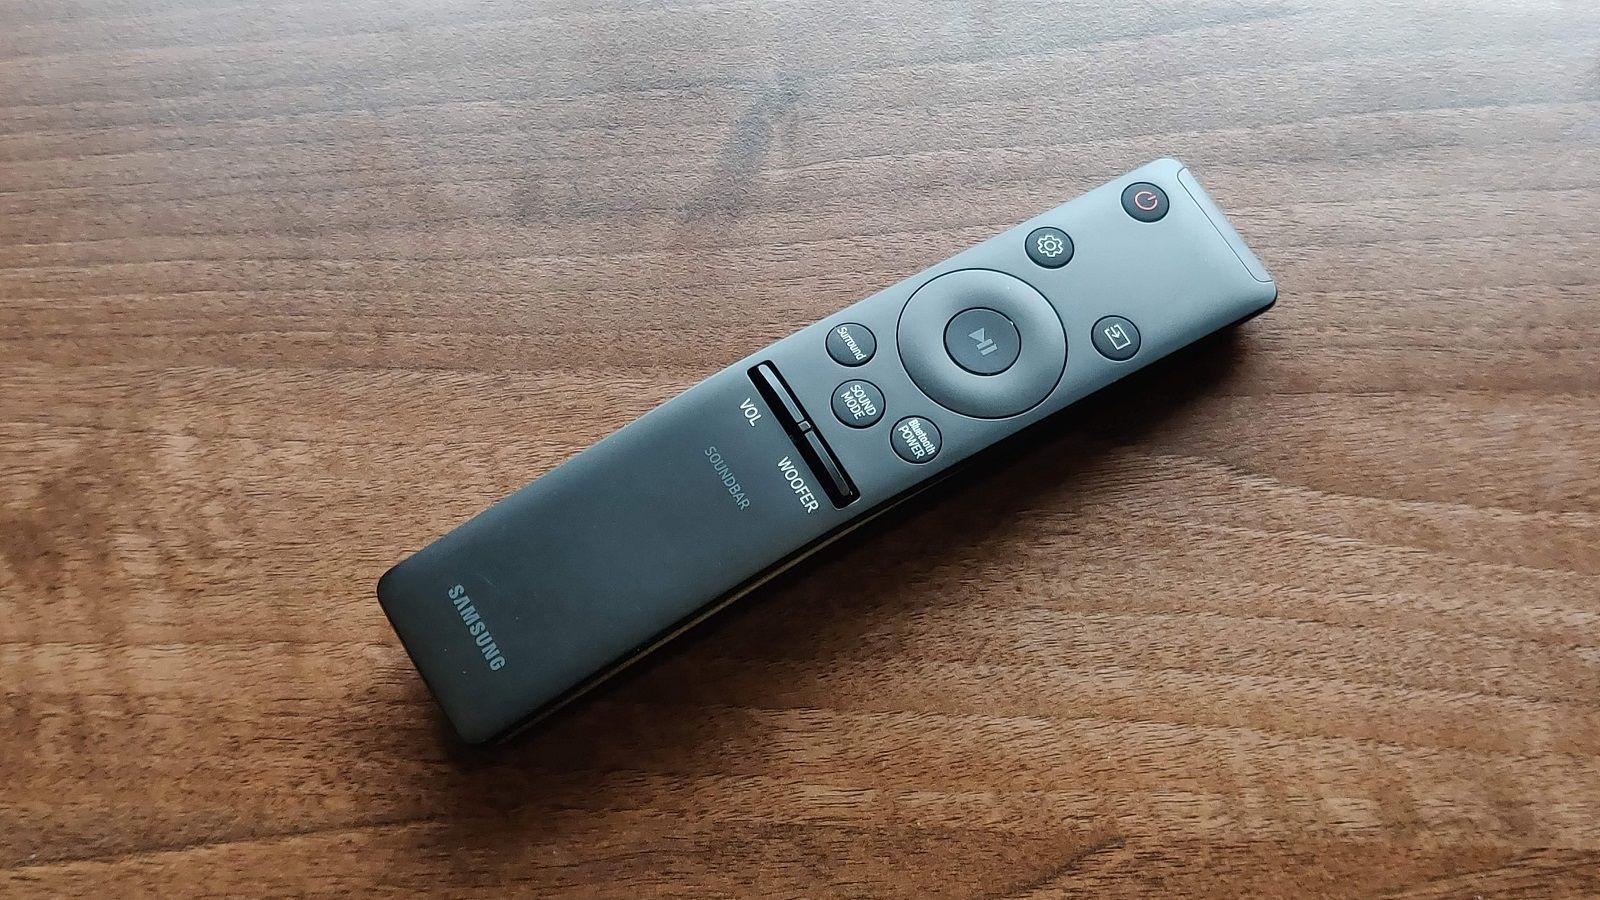 Samsung M450 remote control